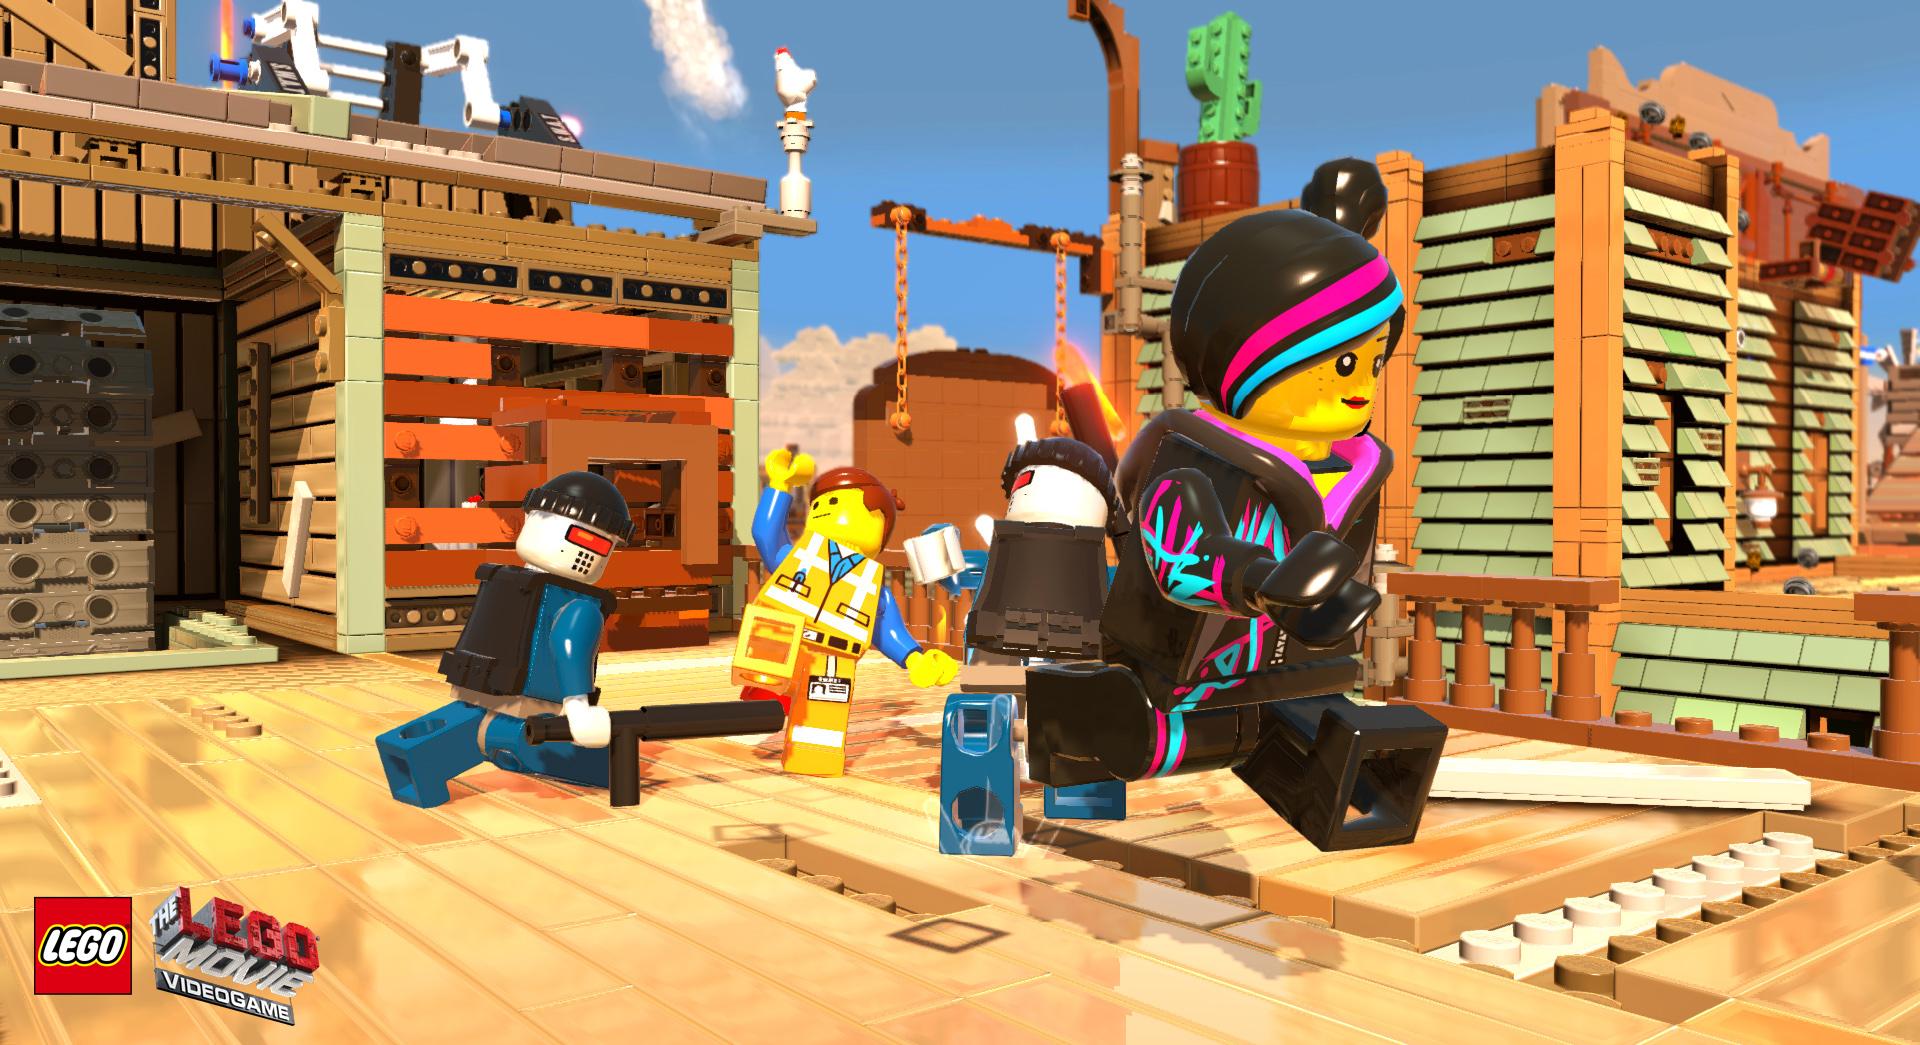 The LEGO Movie Videogame Tlm_bricksburg25